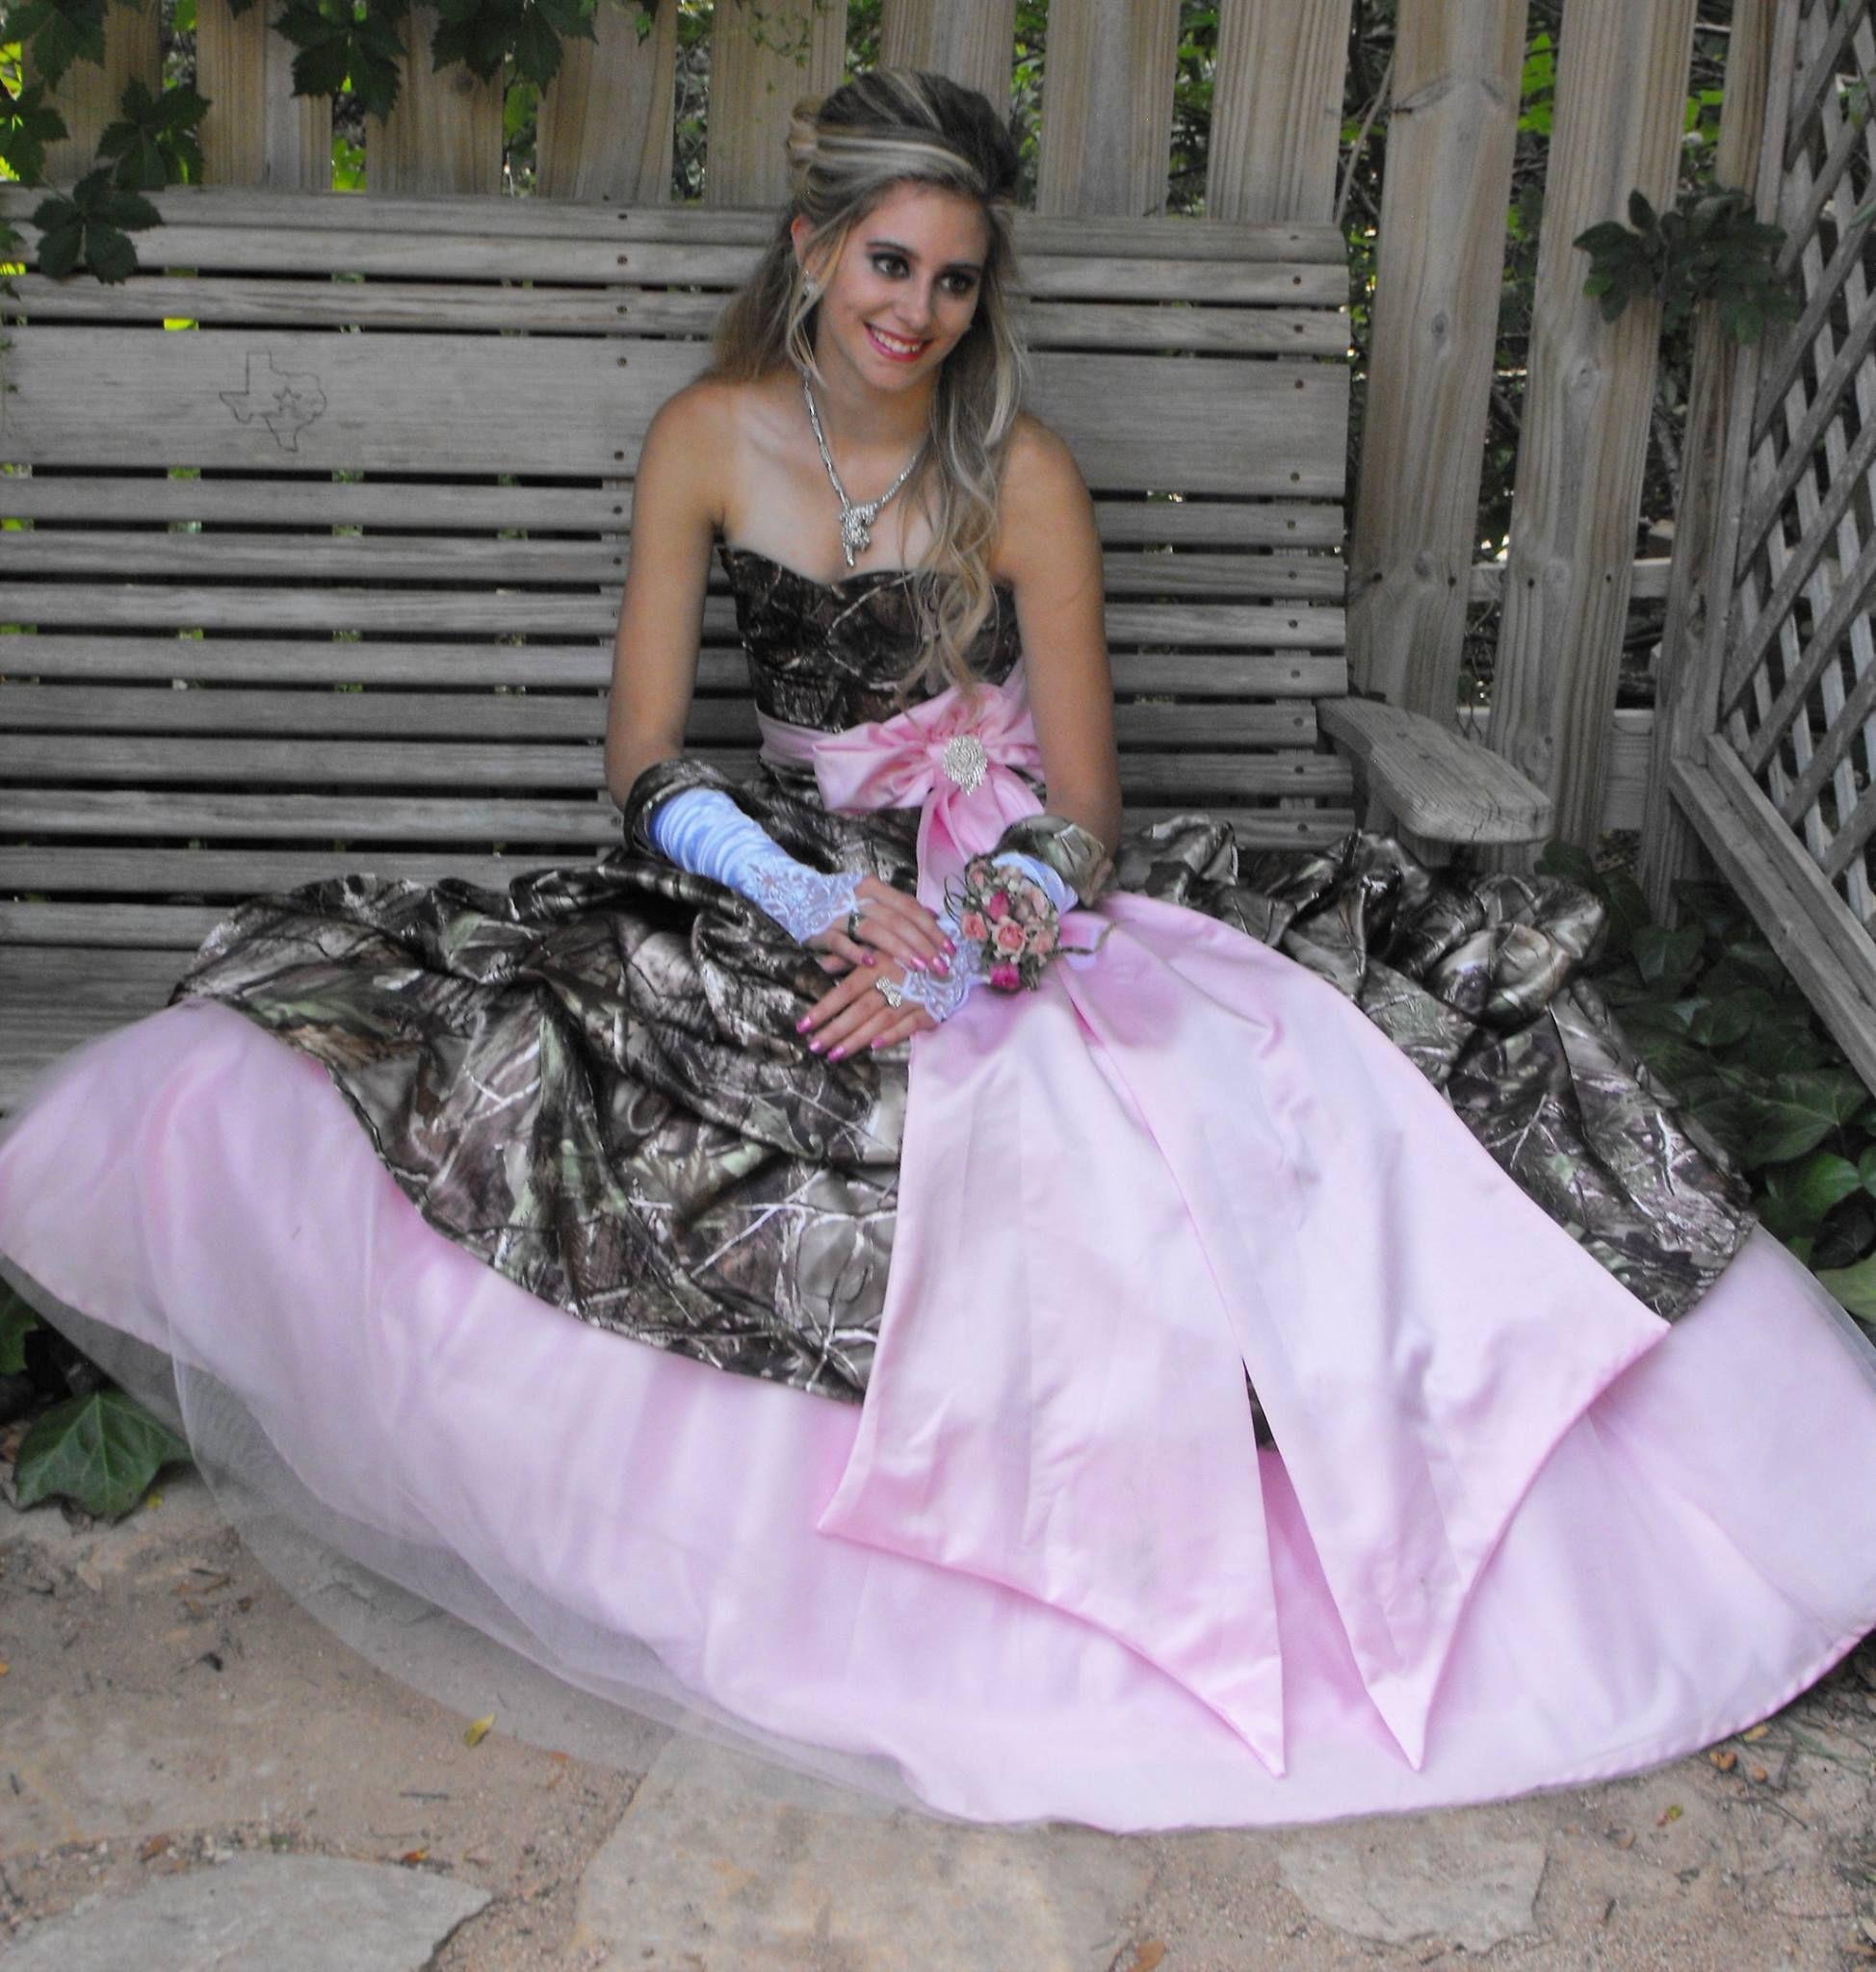 Realtree APG Camo Prom Dress #Realtreecamo   Camo Prom   Pinterest ...